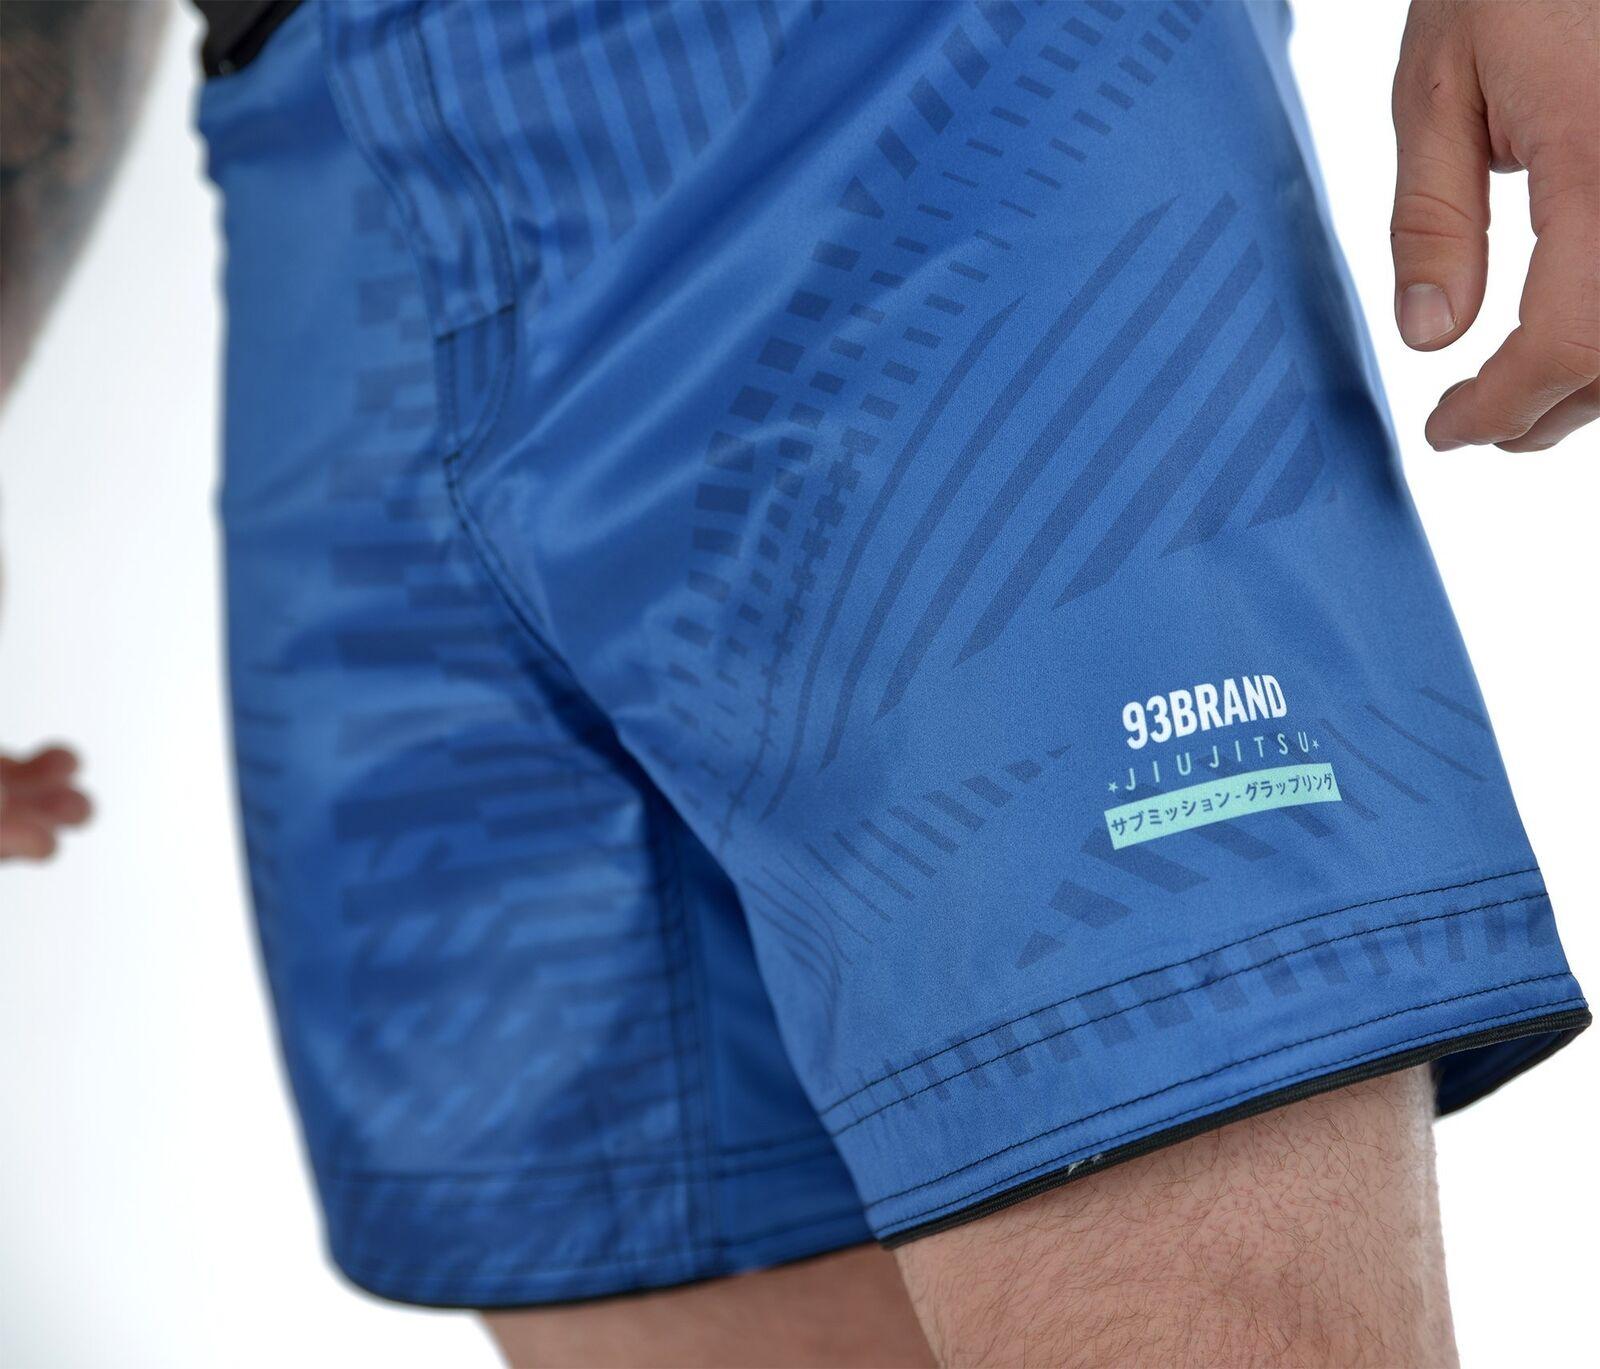 93  Brand 'Citizen 5.0' Shorts (Short Length)  general high quality